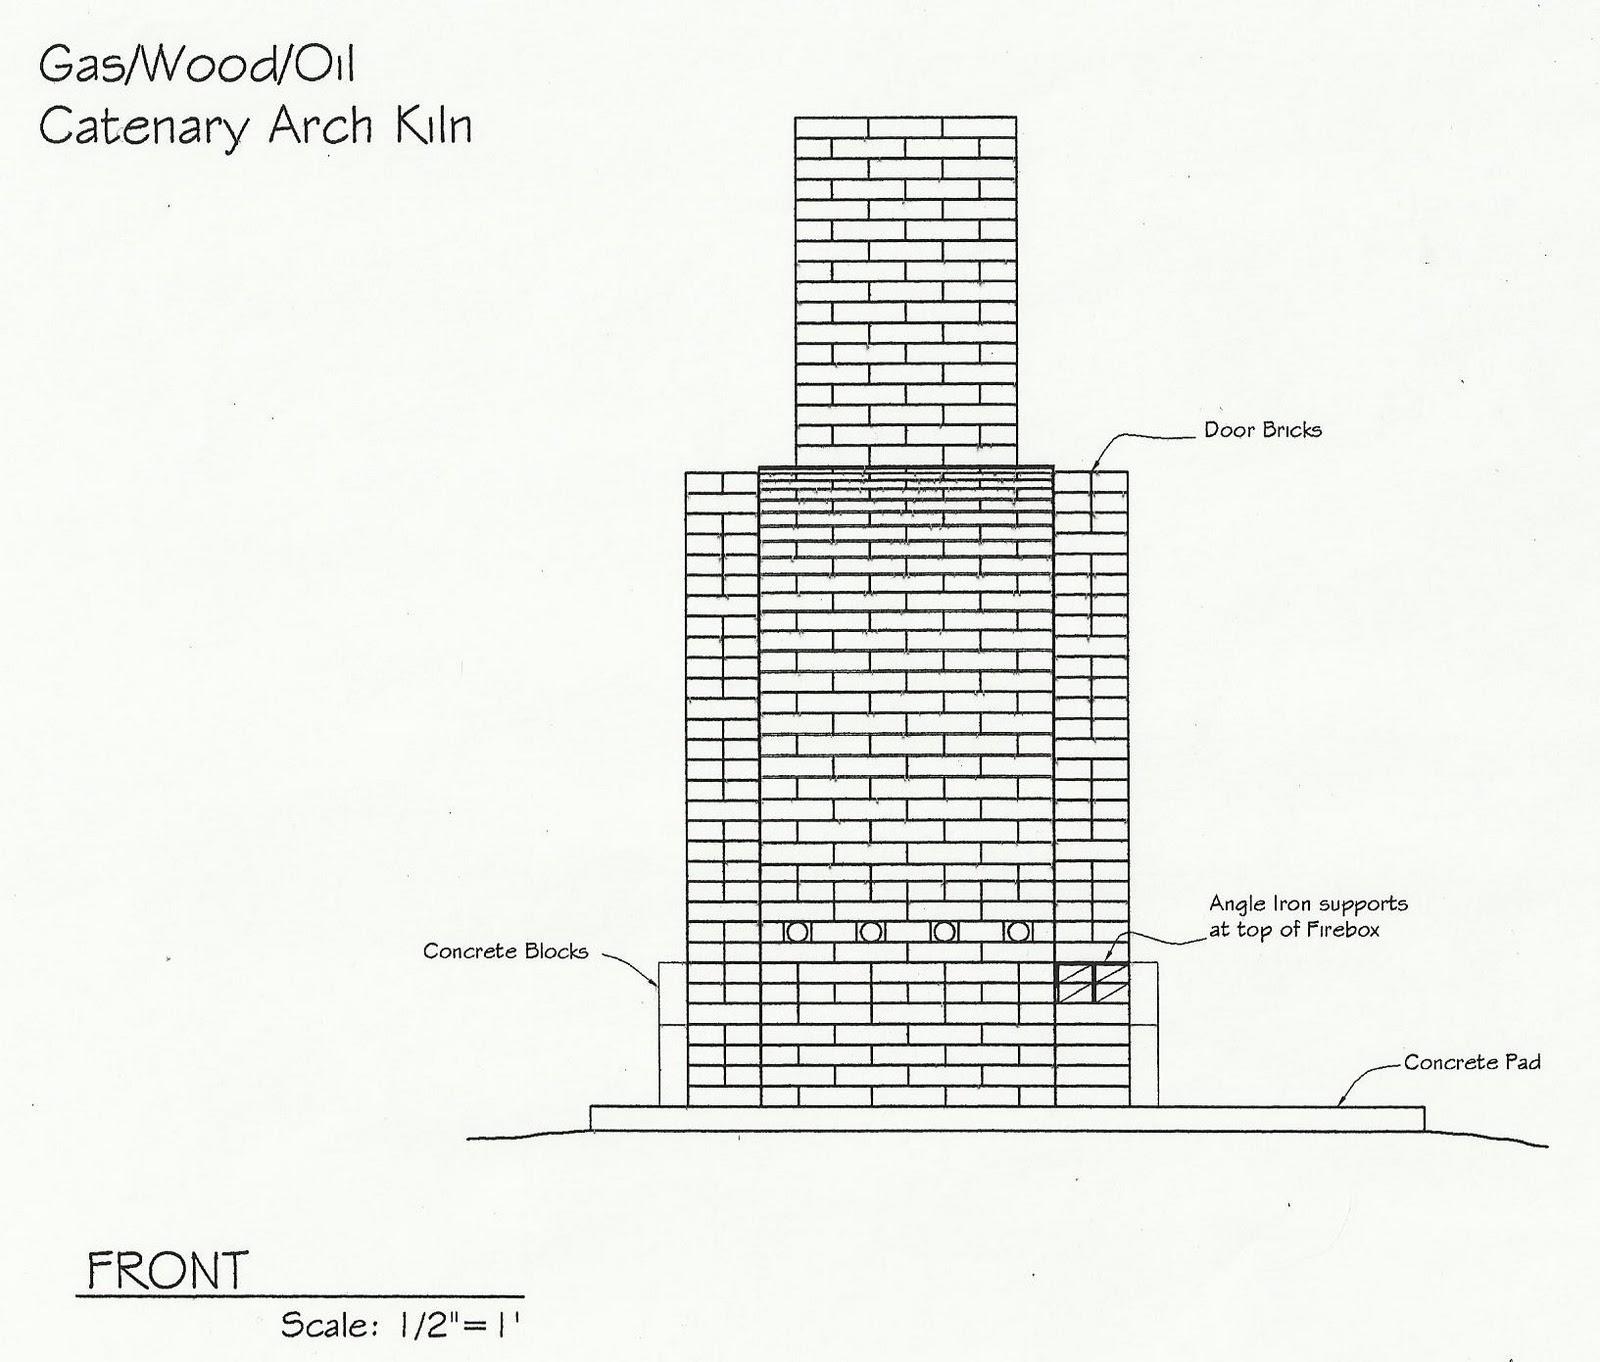 Cmu 442 Kiln Construction Jake Allee Project 2